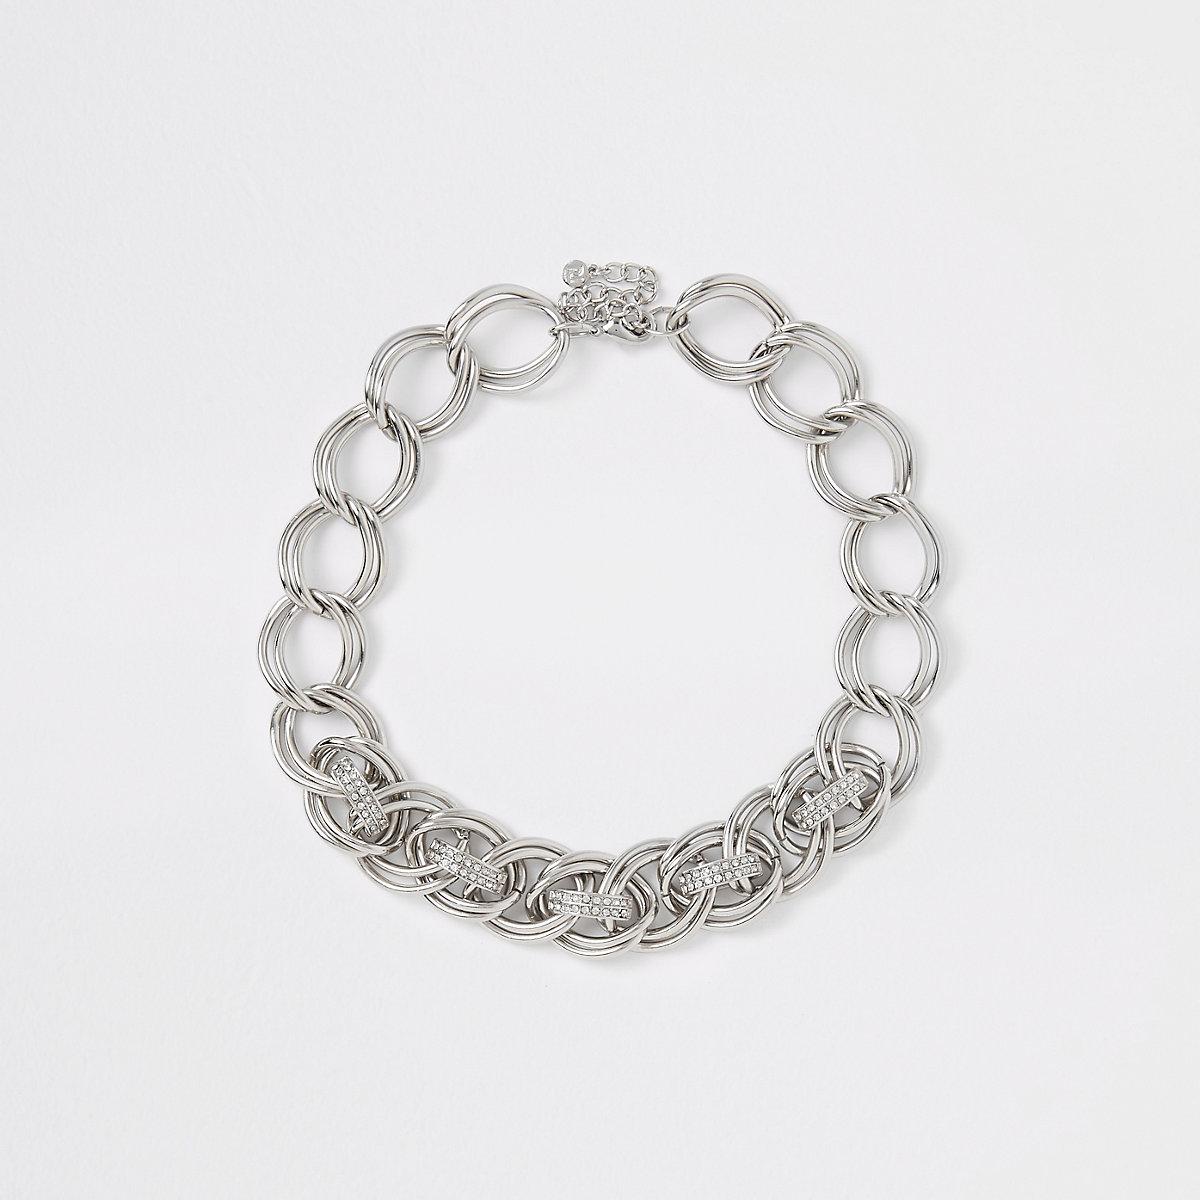 Silver color rhinestone pave link necklace